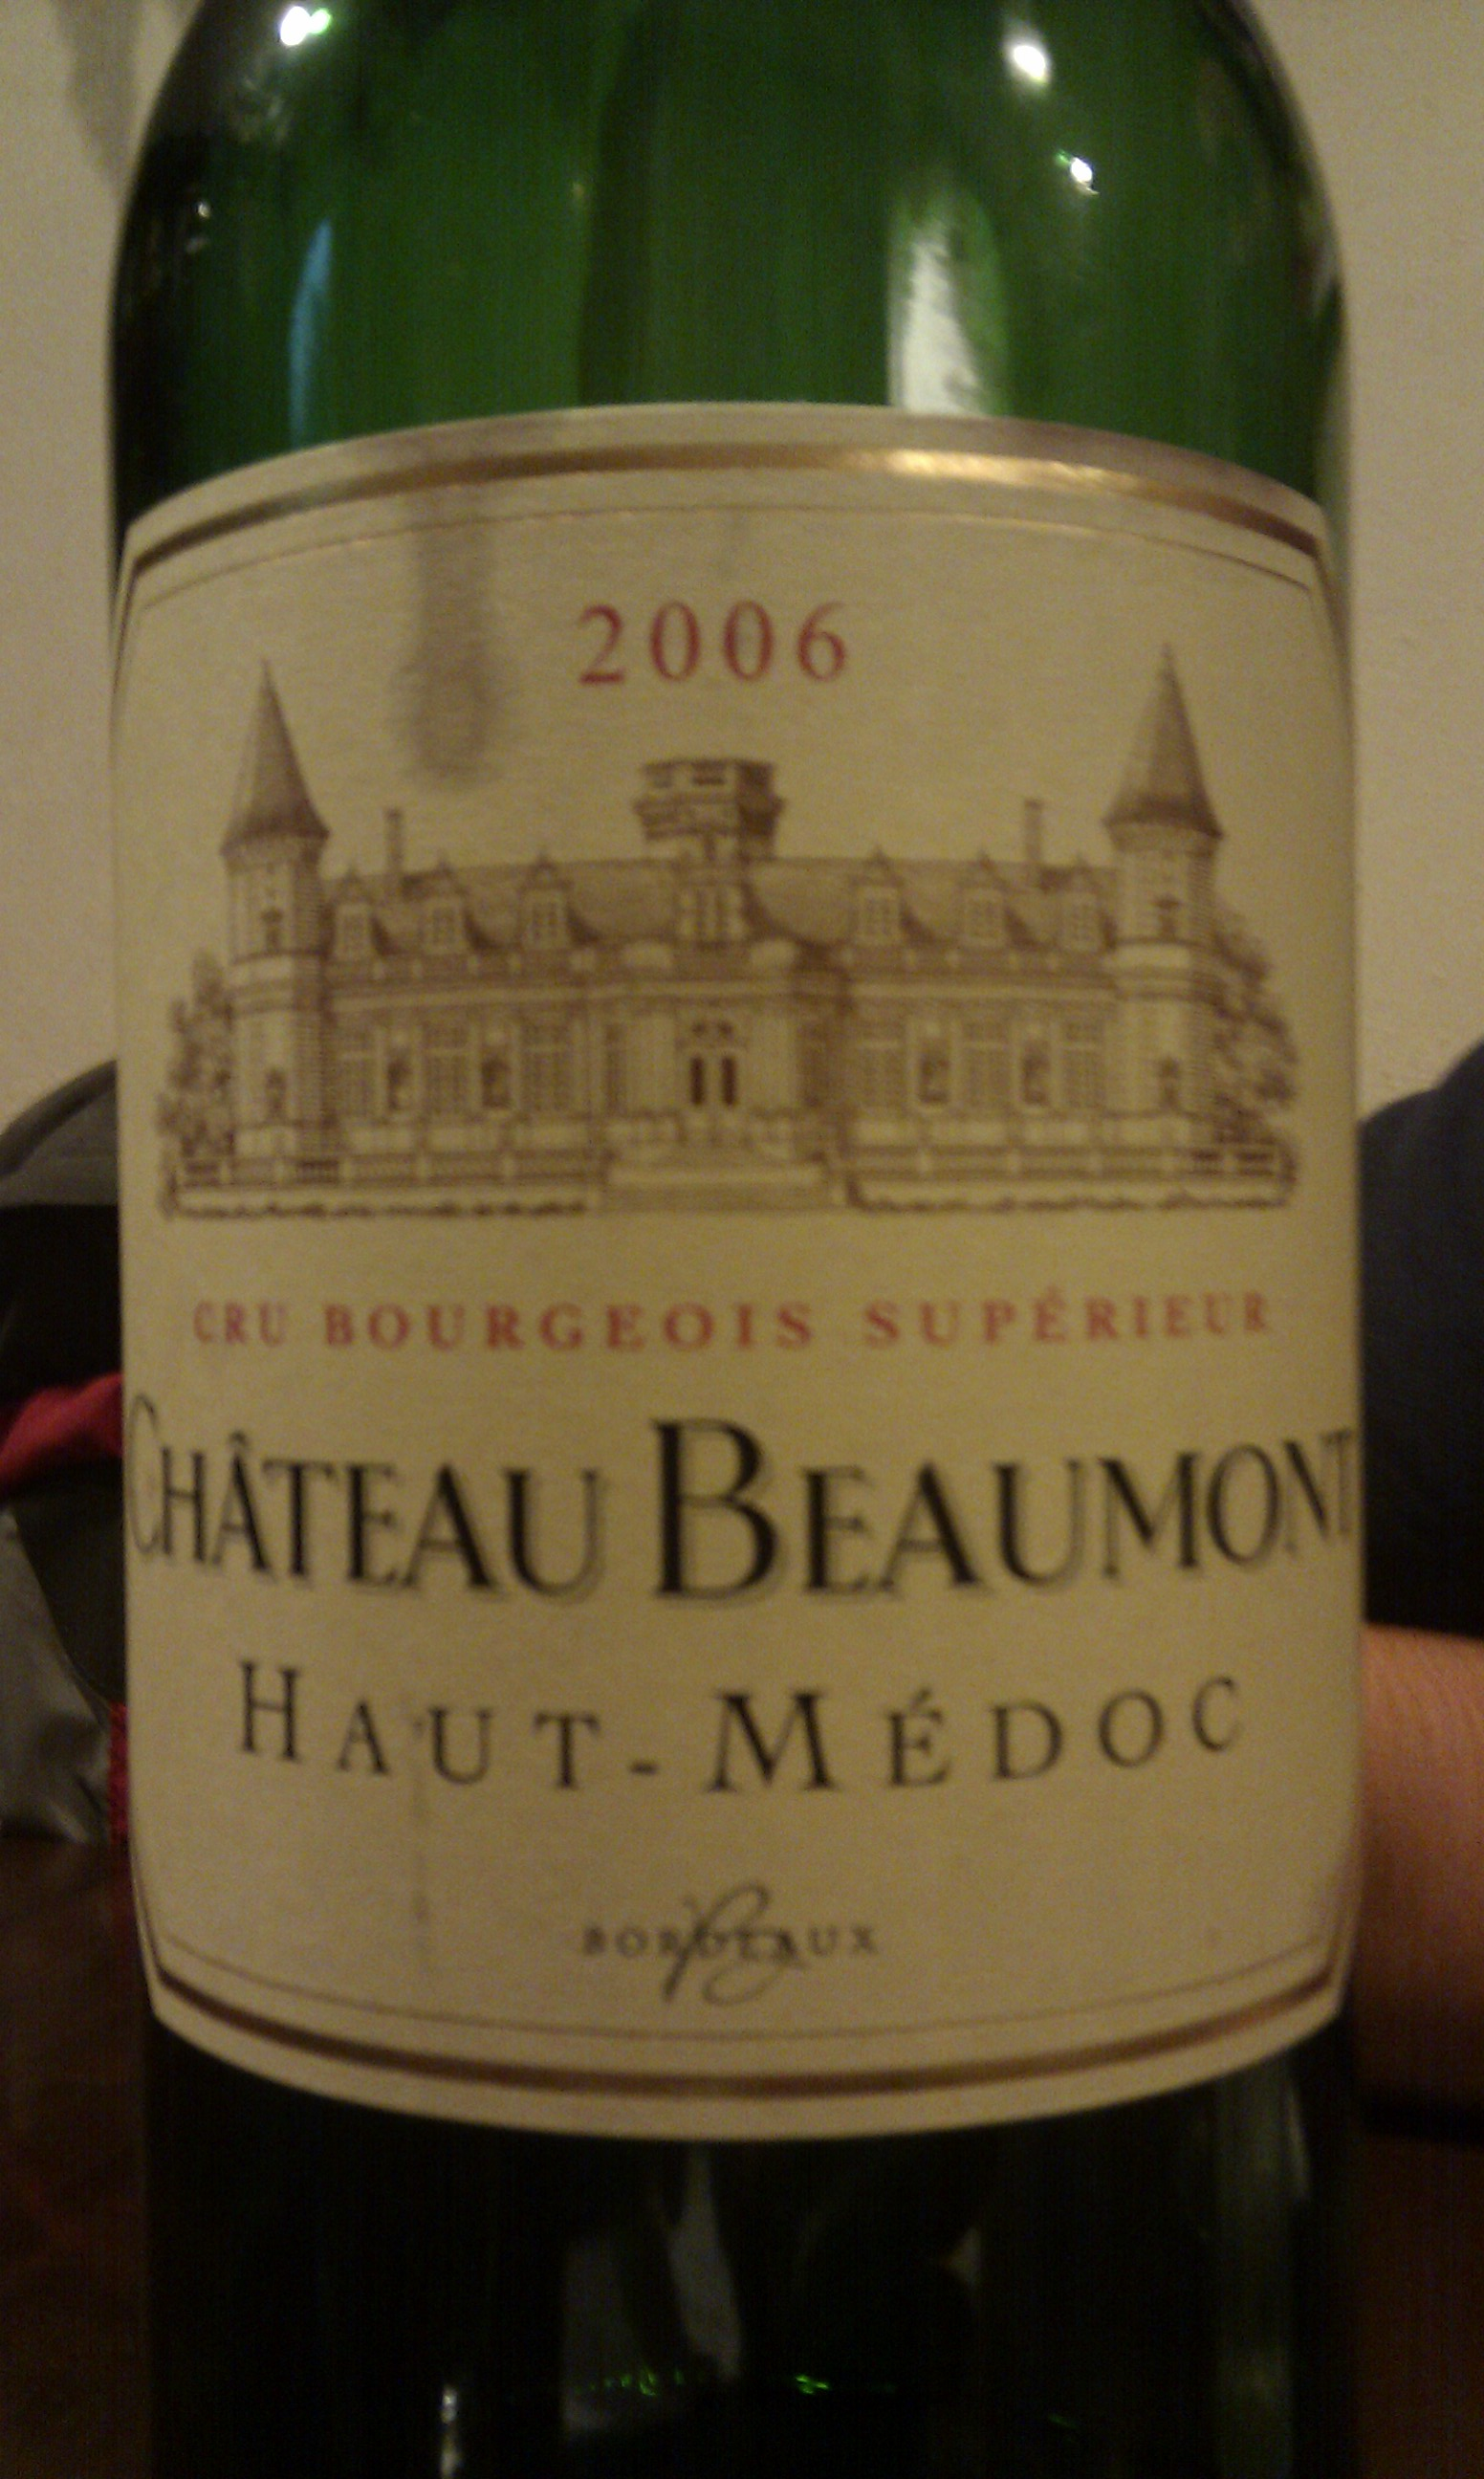 2006 Chateau Beaumont